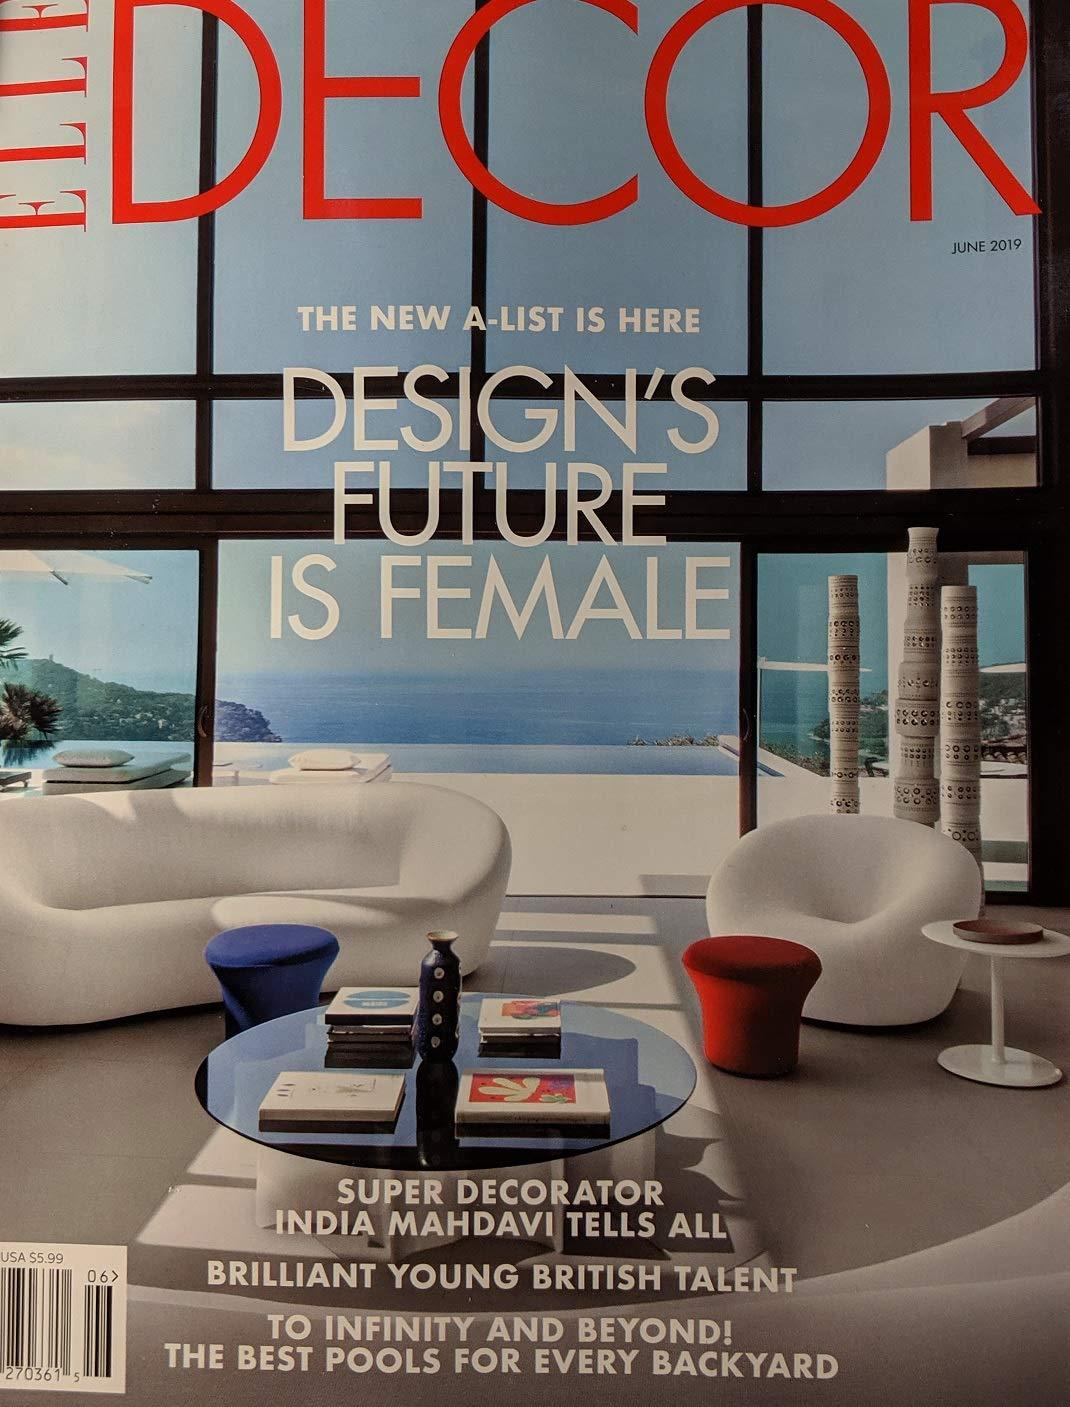 Elle Decor Magazine June 2019 Designs Future Is Female